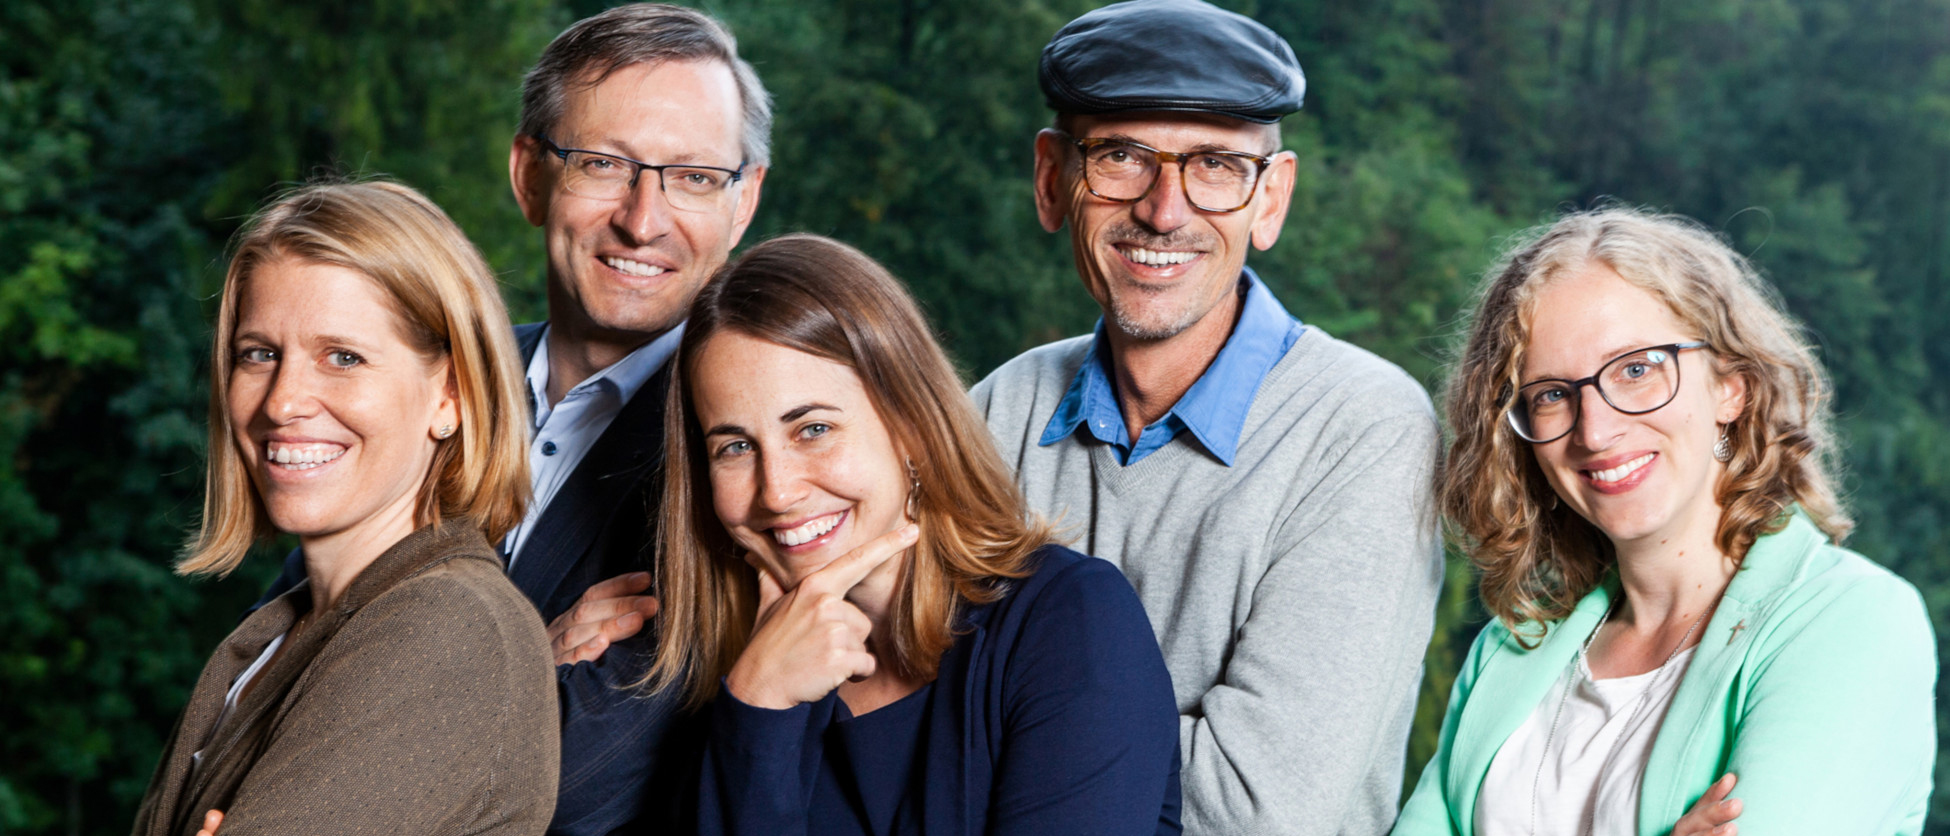 Neu beim «Wort zum Sonntag»: v.l. Nathalie Dürmüller, Urs Corradini, Veronika Jehle, Simon Gebs und Antje Kirchhofer